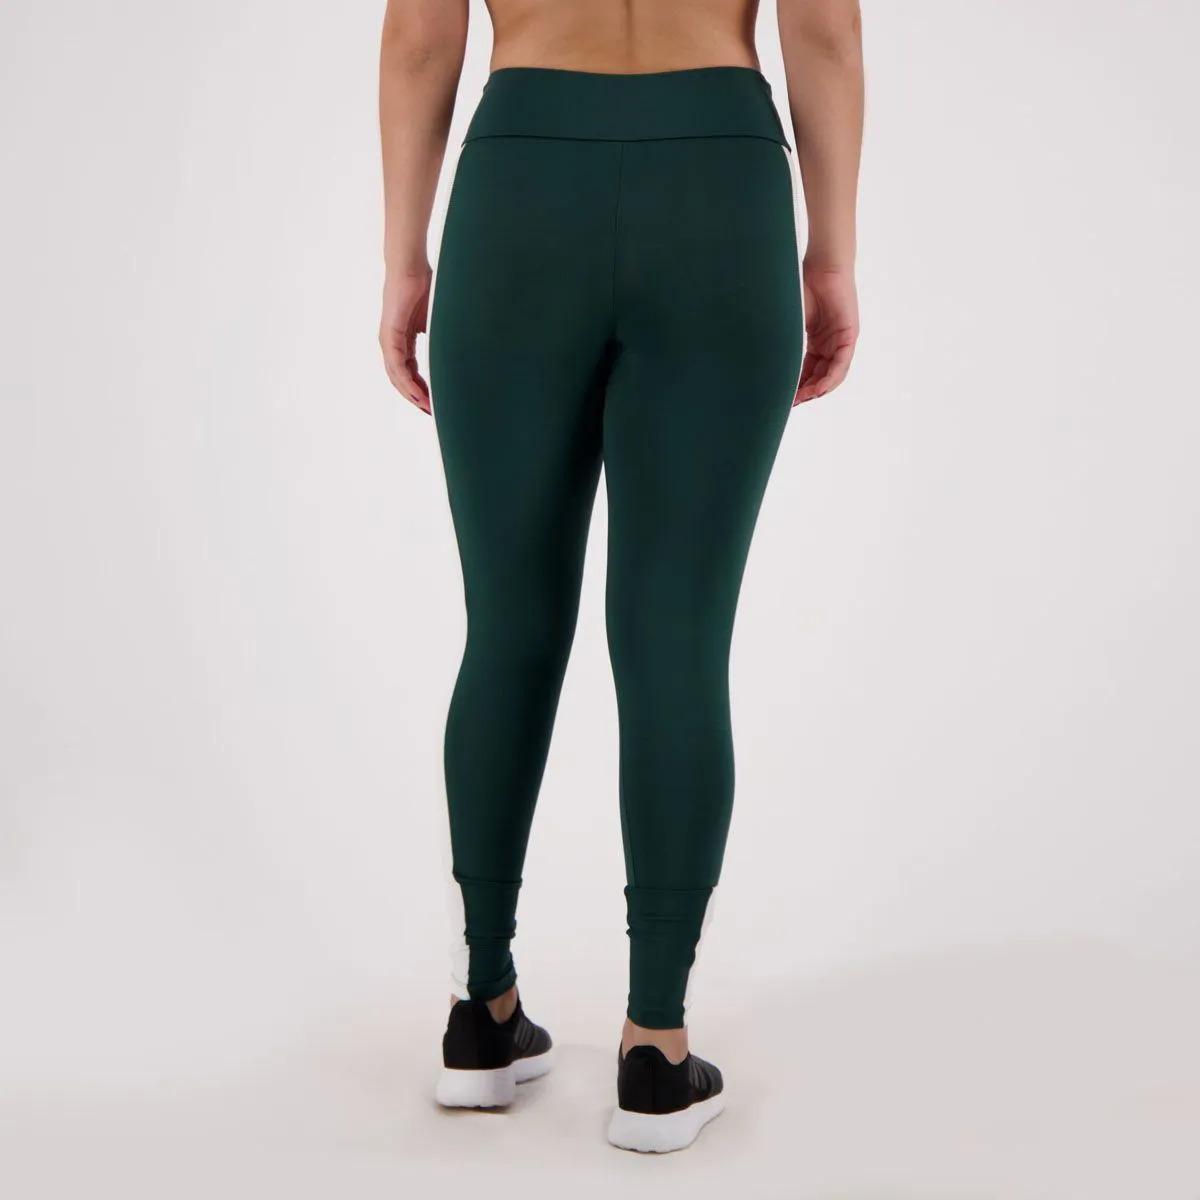 Calça Fluminense Feminina Fitness